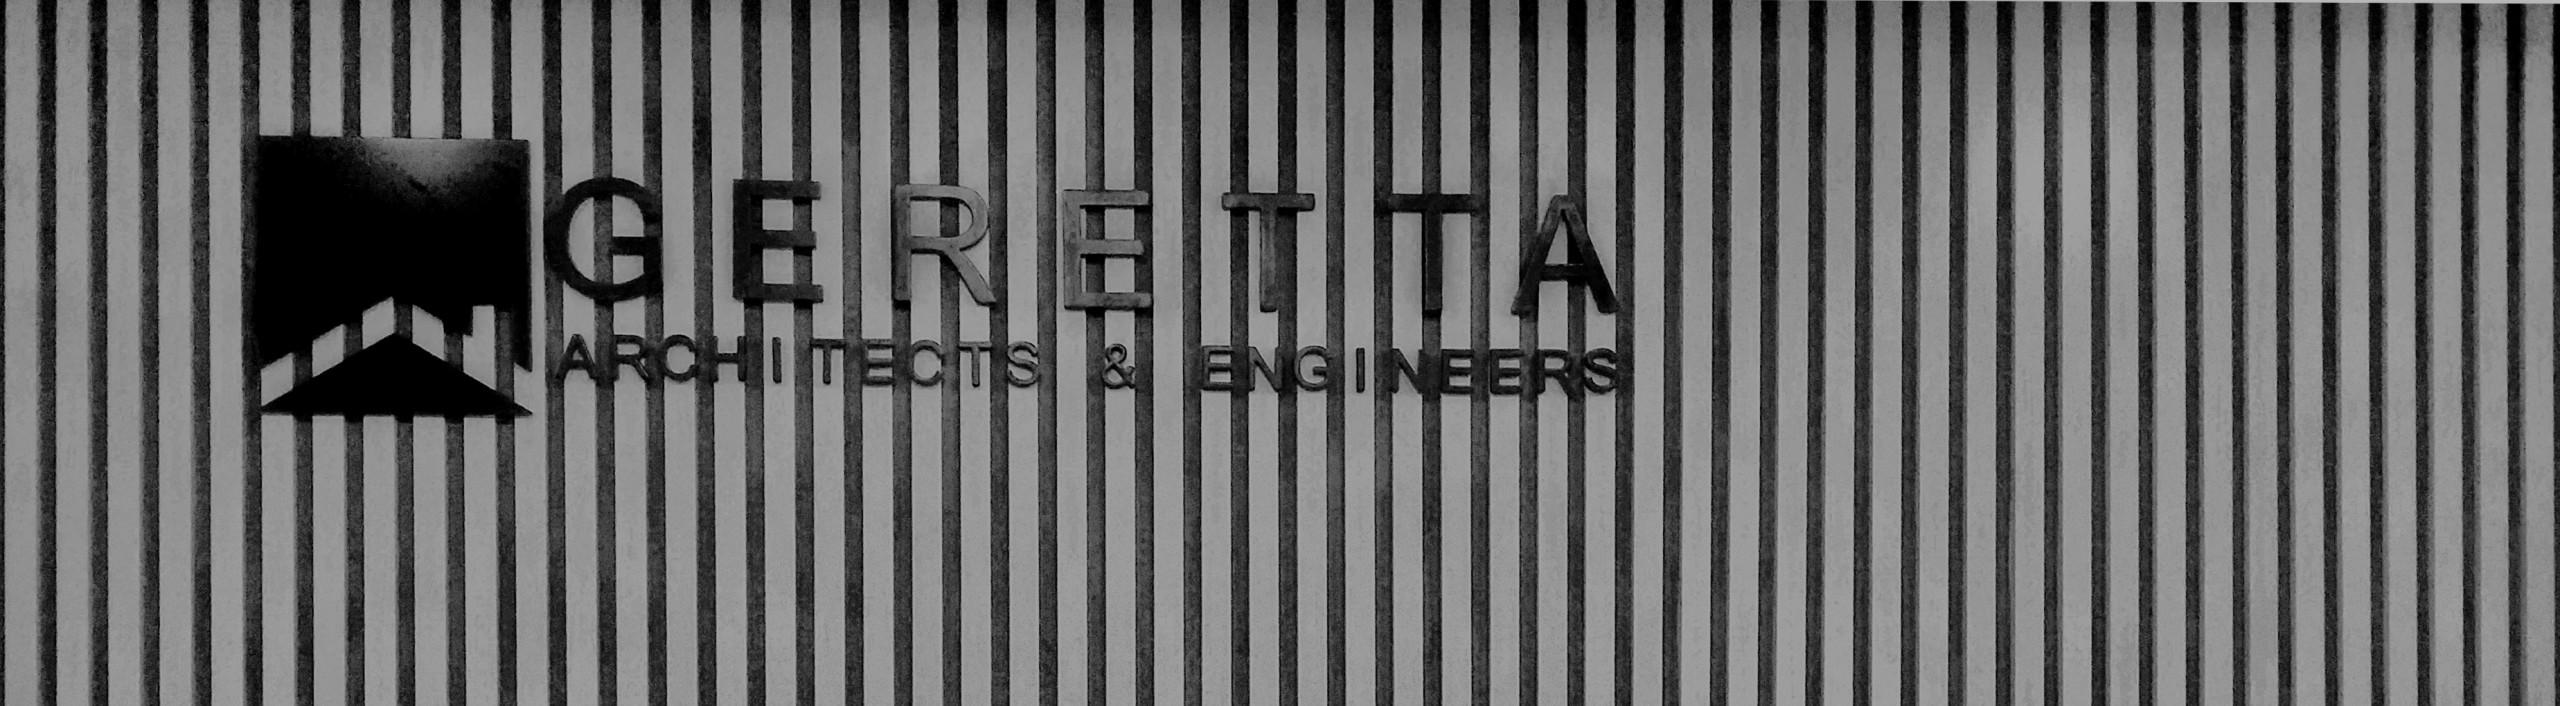 geretta 013 scaled - geretta-013